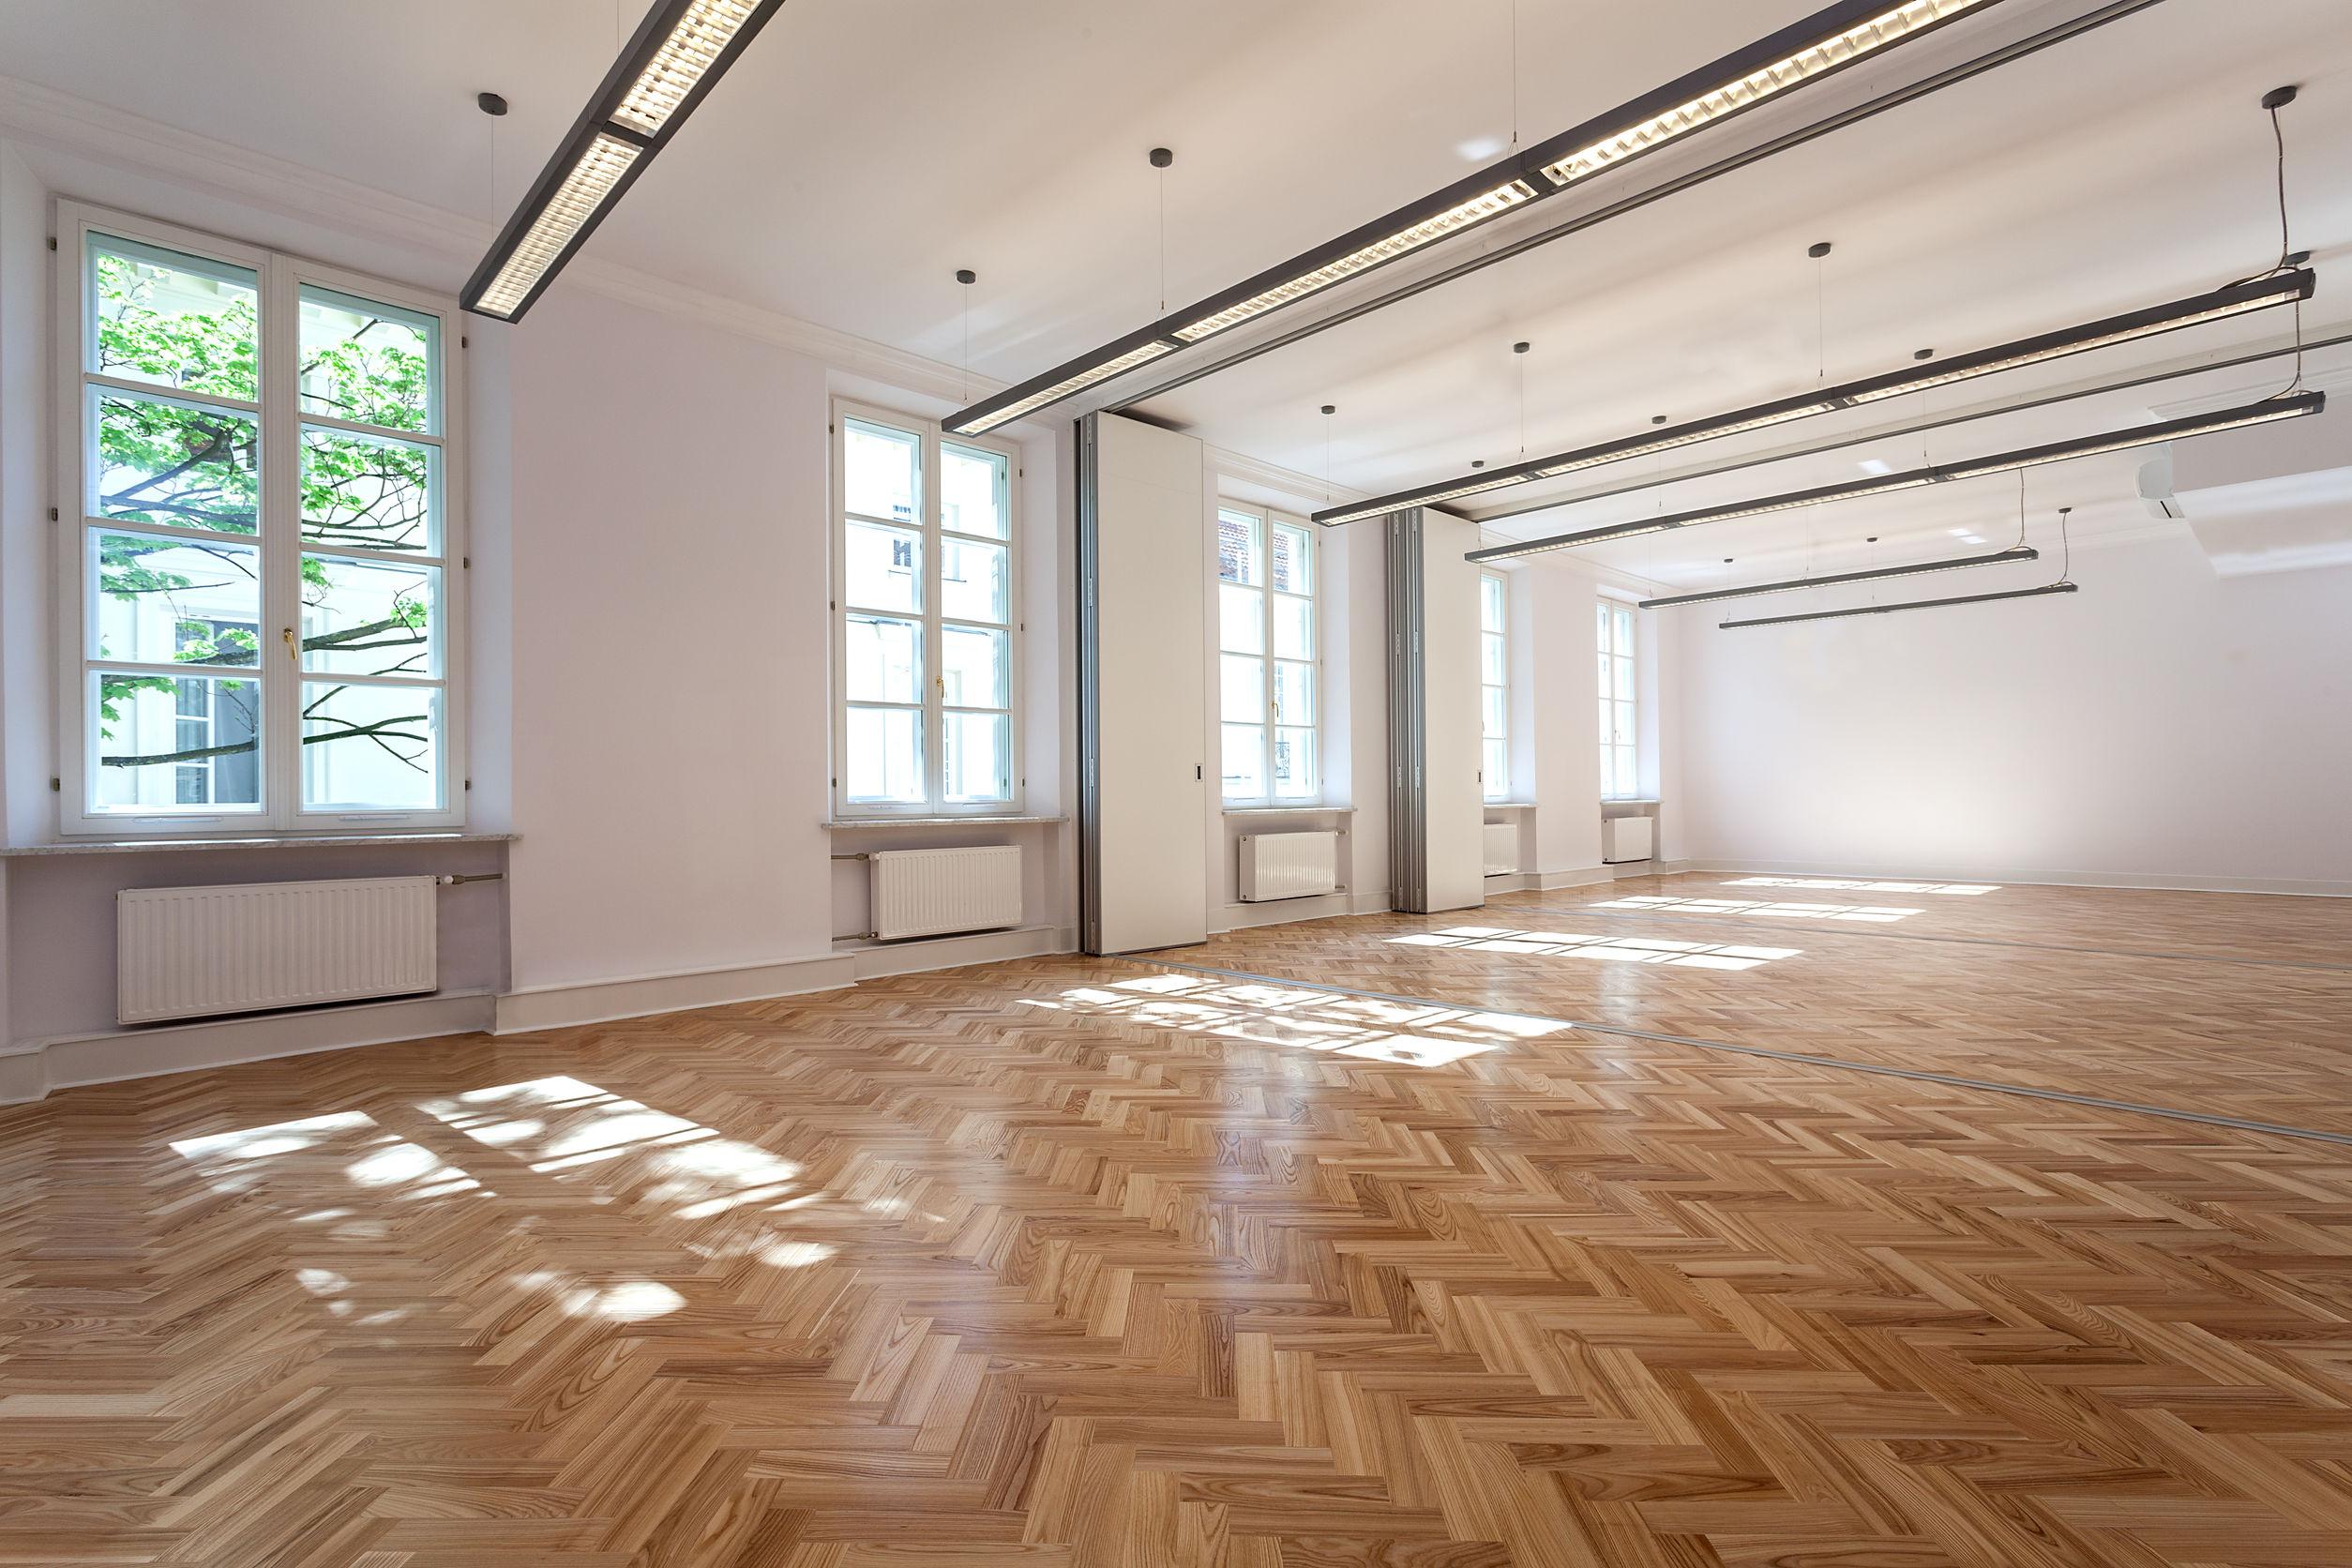 Example of Parquet Wood Flooring